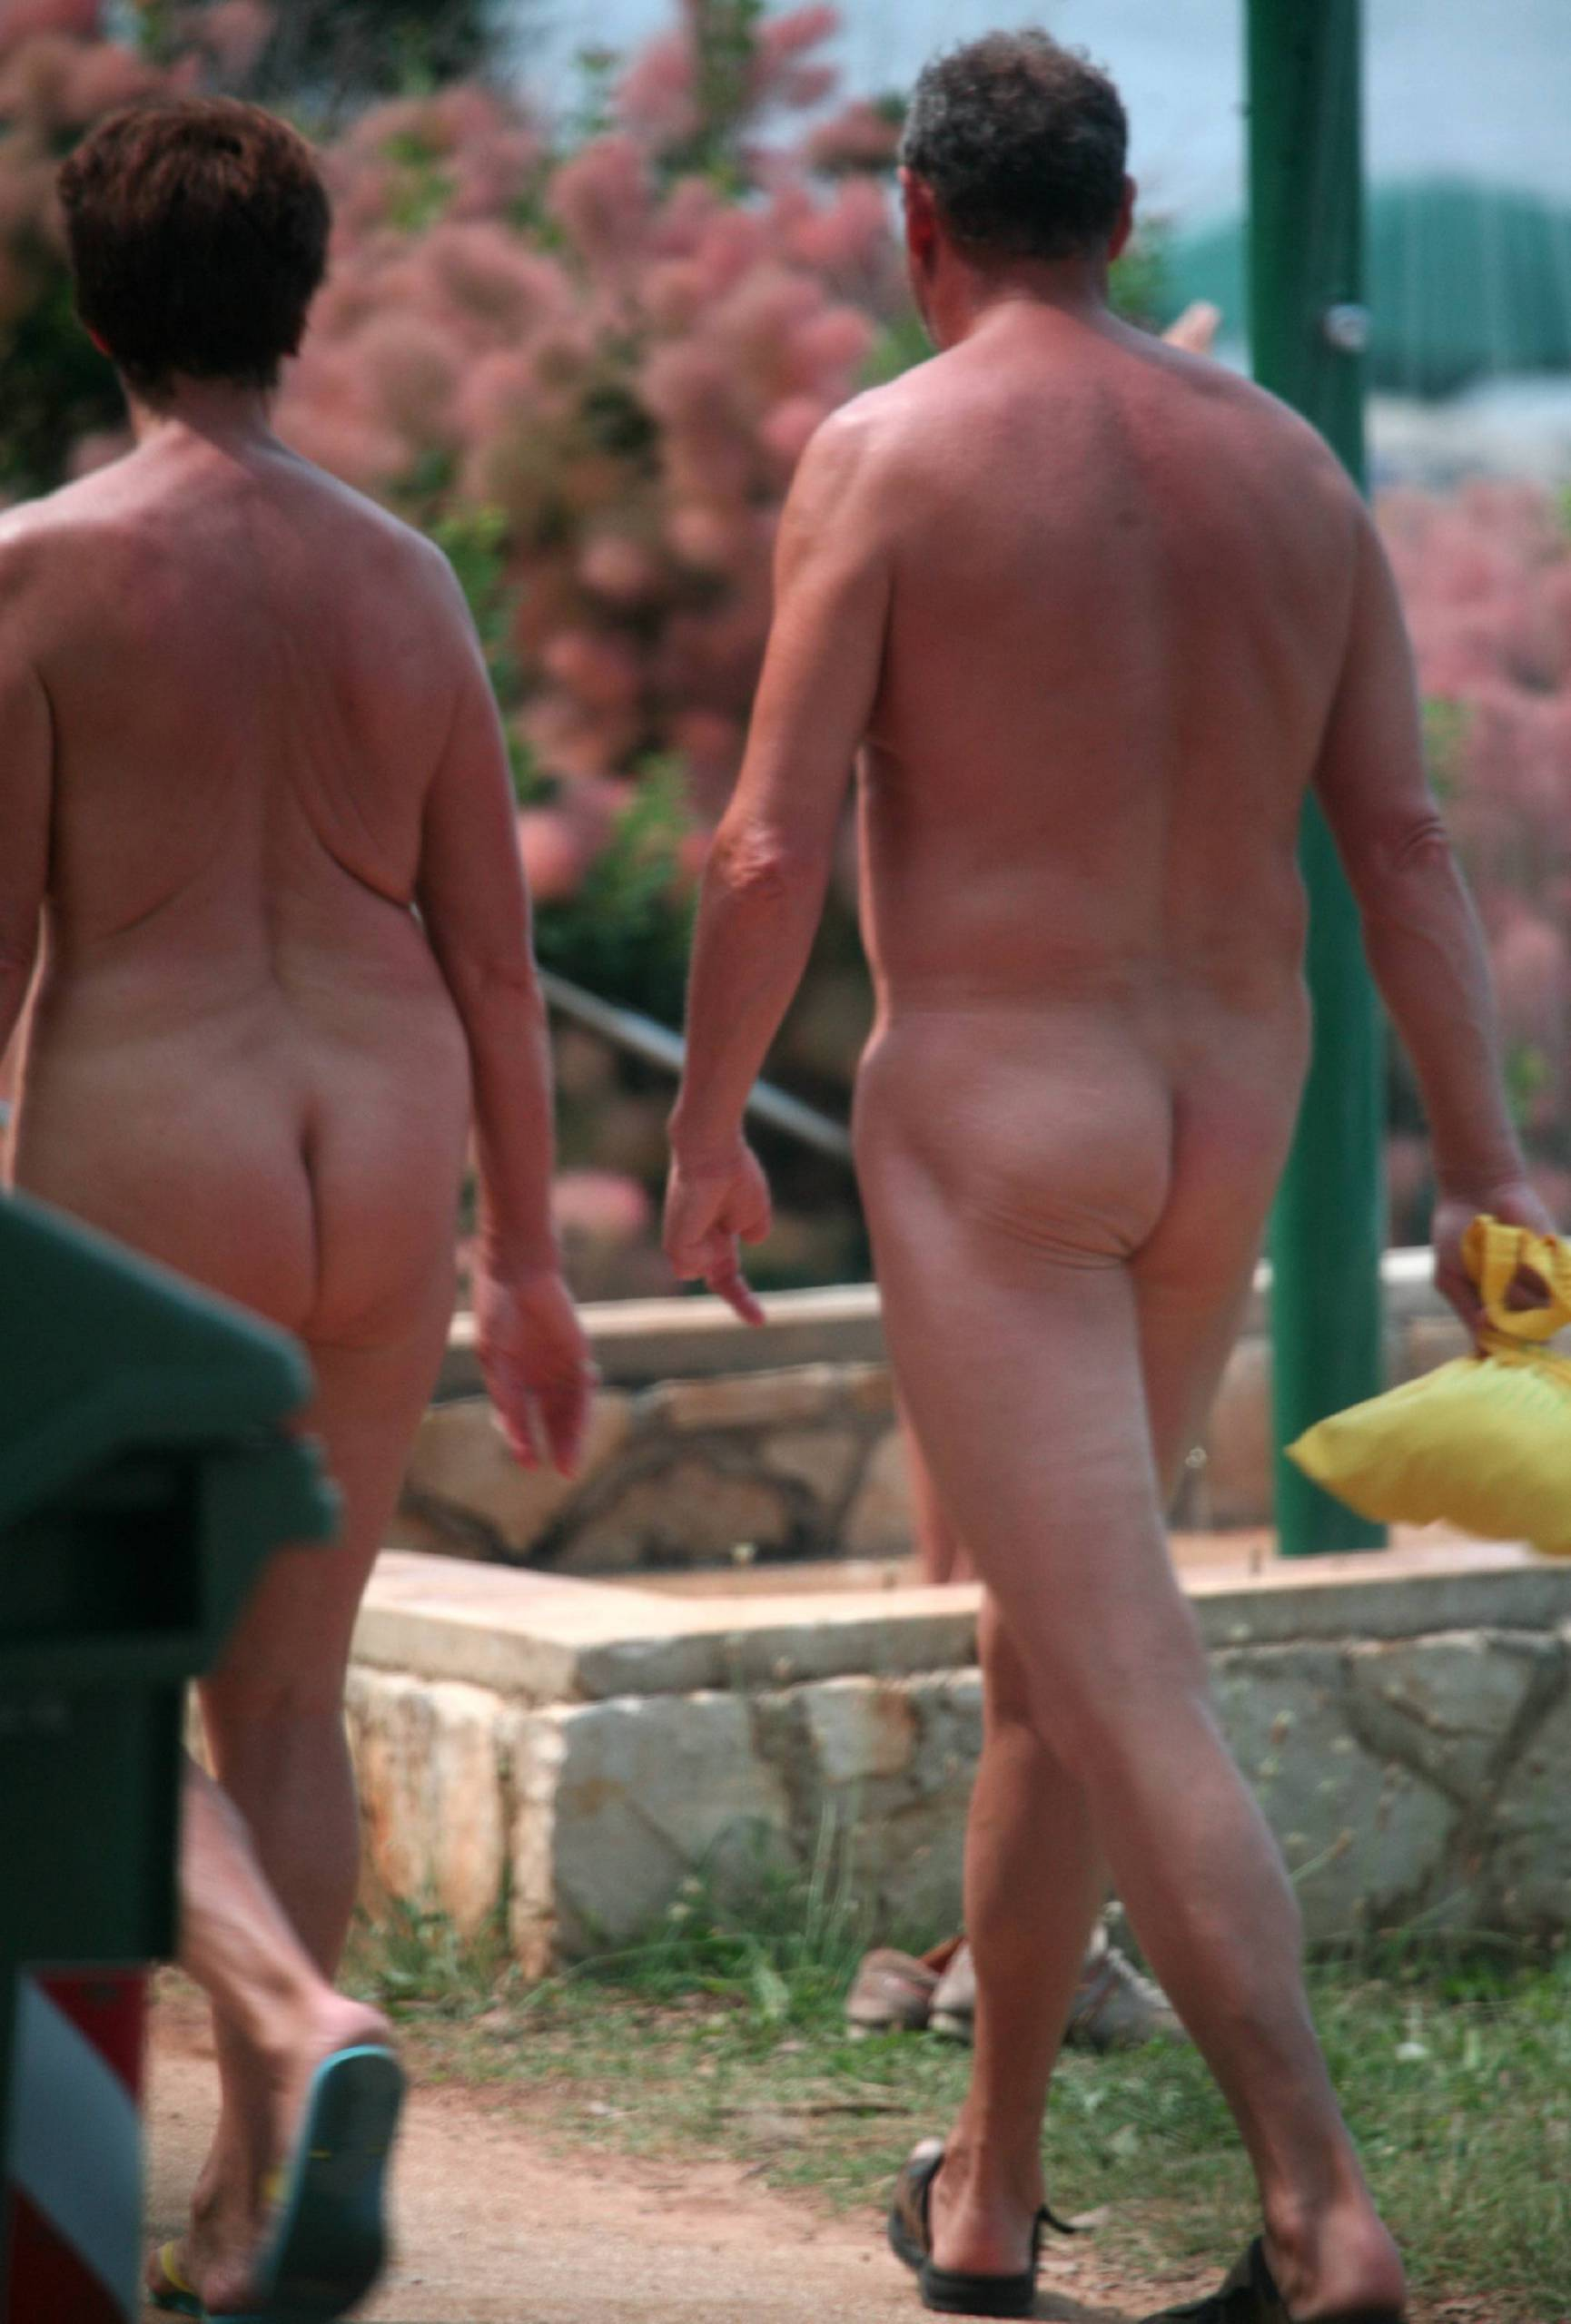 Naturist Shower Profiles - 1